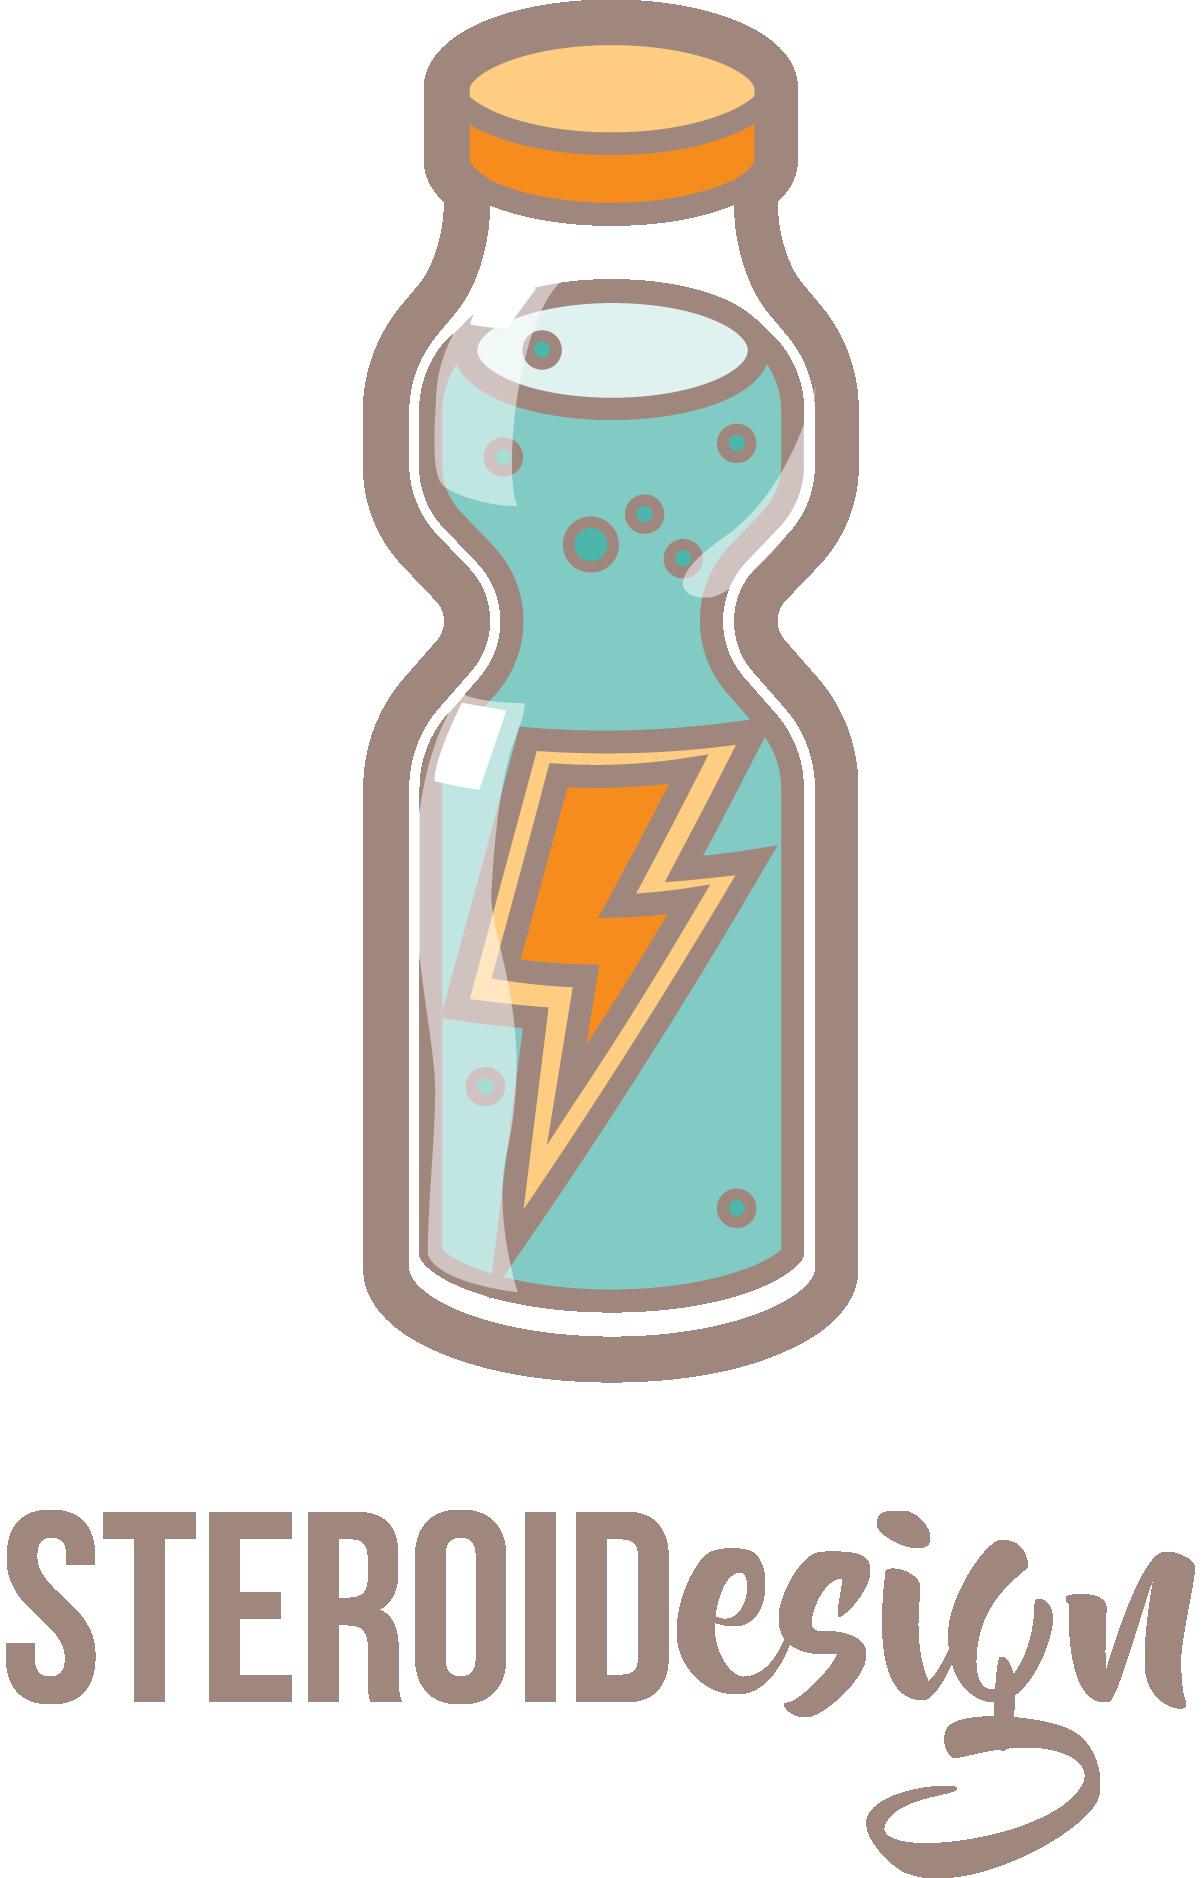 Steroidesign